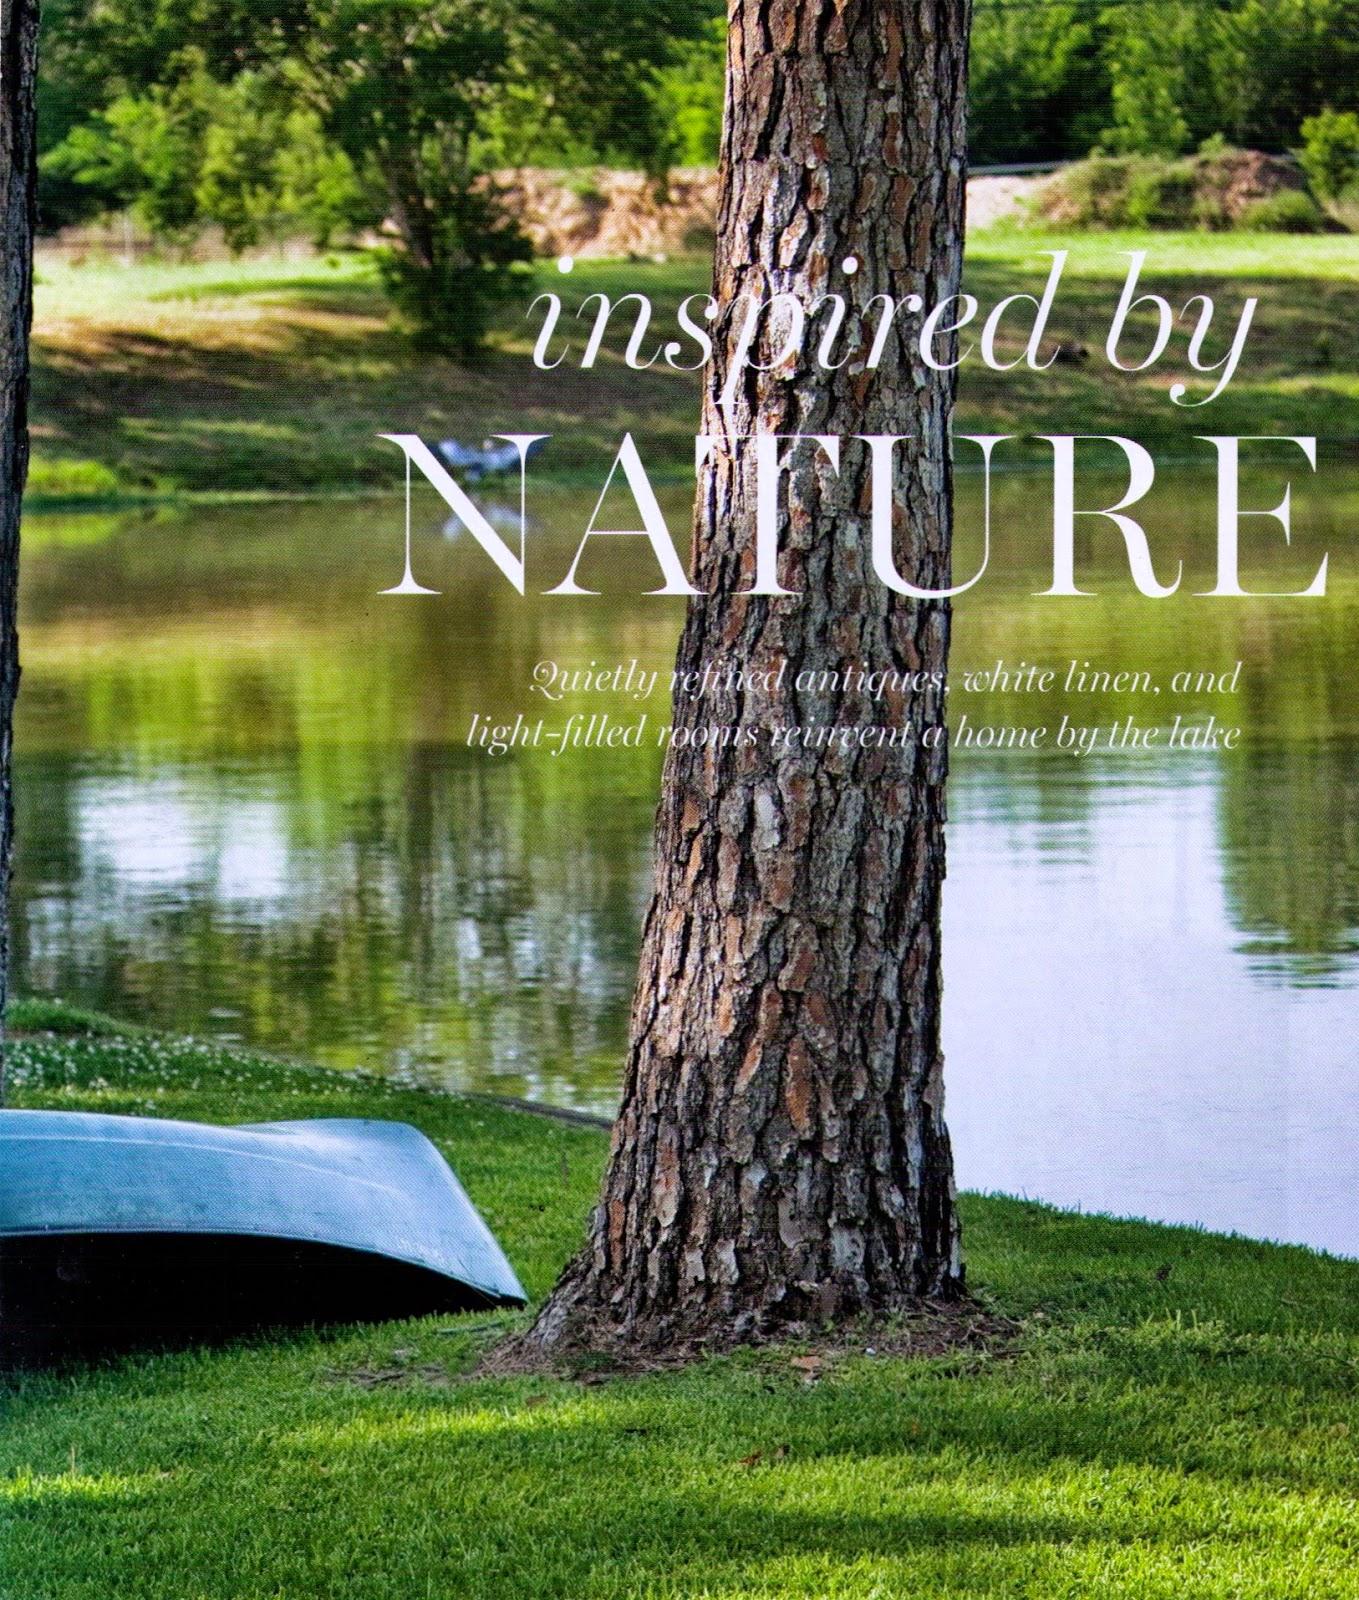 Interior Design By Shannon Bowers Photography Peter Vitale Written Linda Sherbert Inspired Nature Produced Leslie Newsom Rascoe